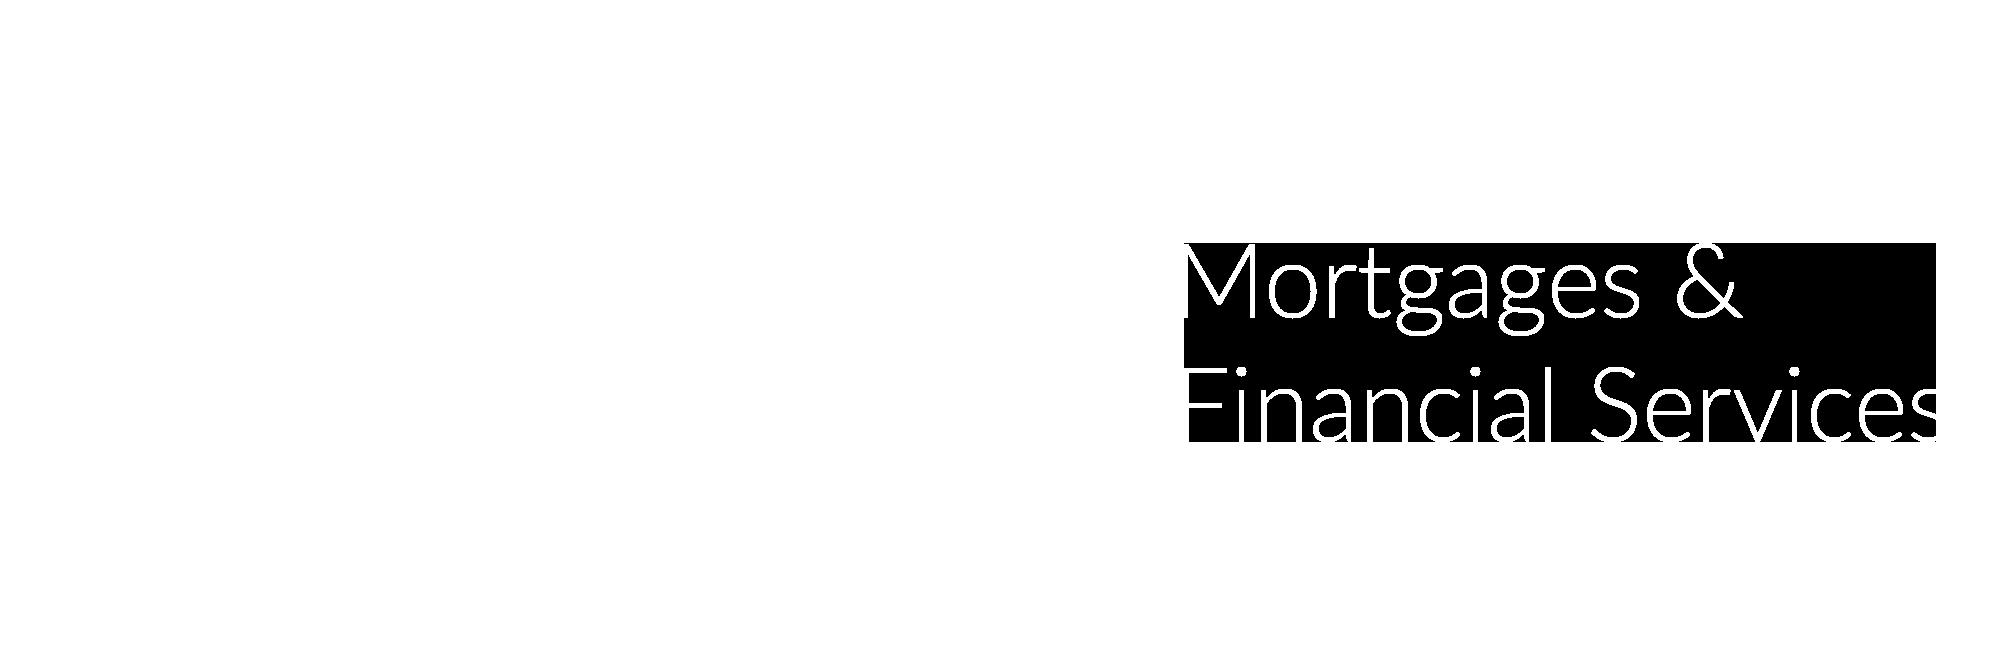 BVS Mortgages